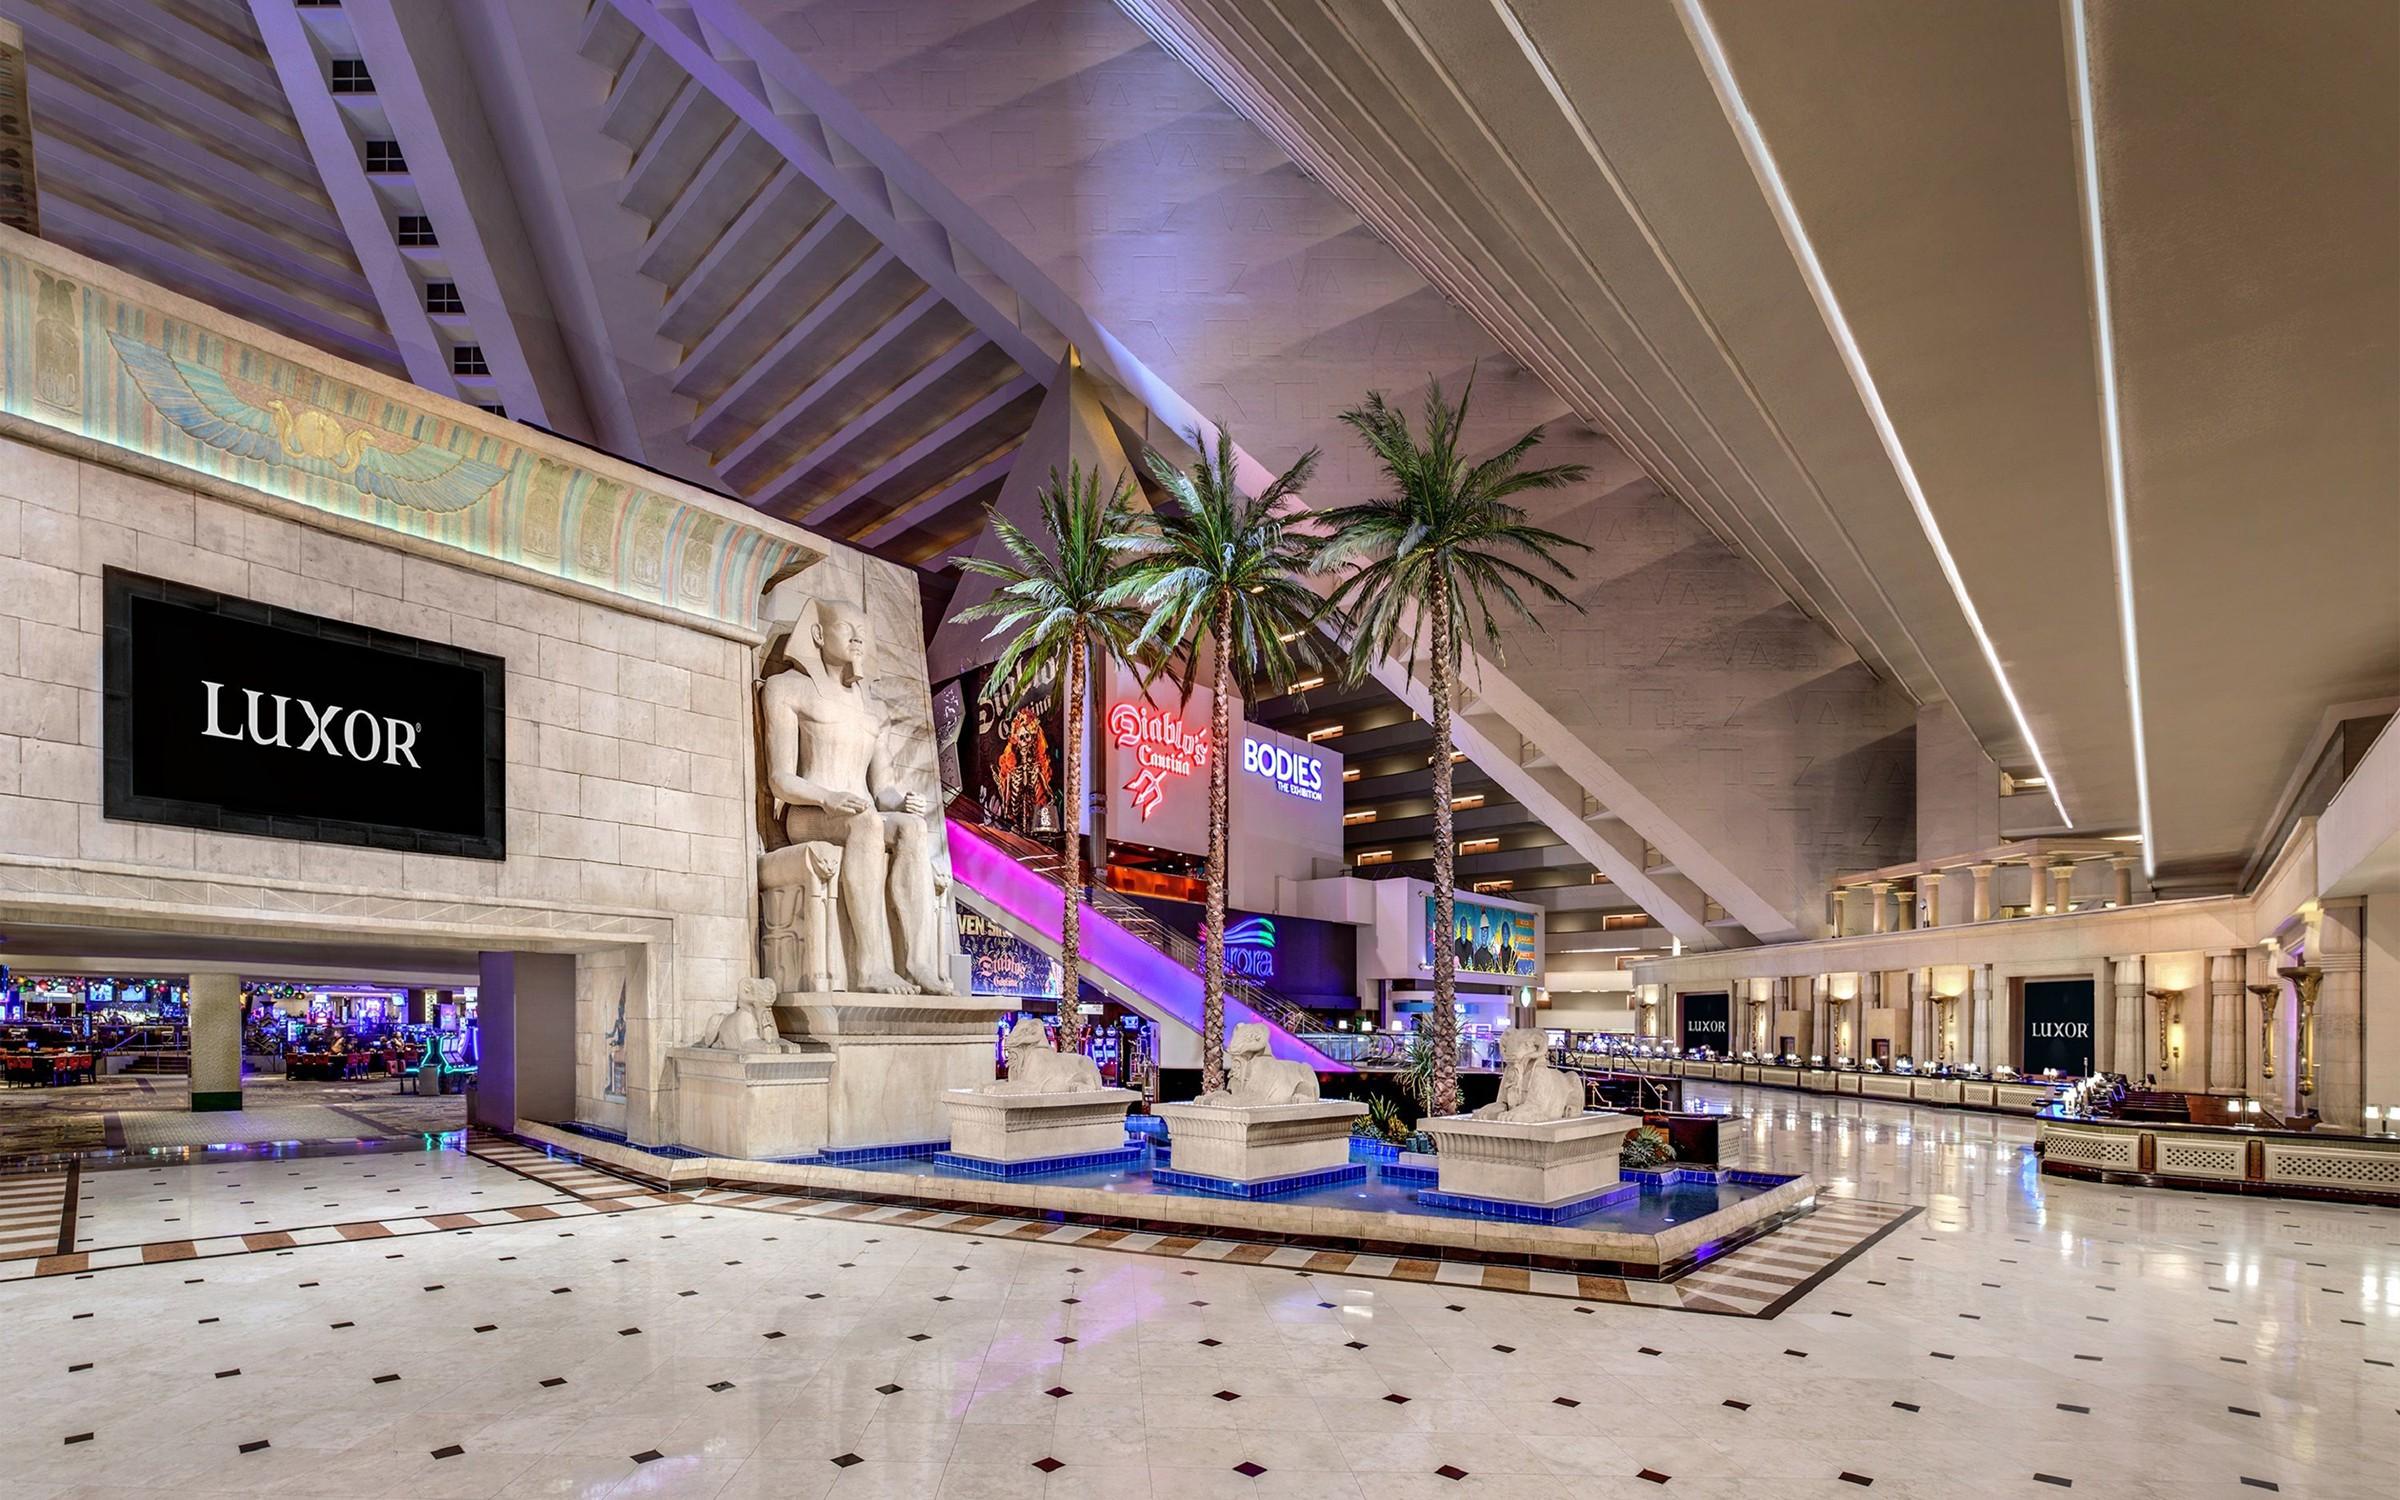 Courtesy of Luxor Hotel and Casino / Expedia